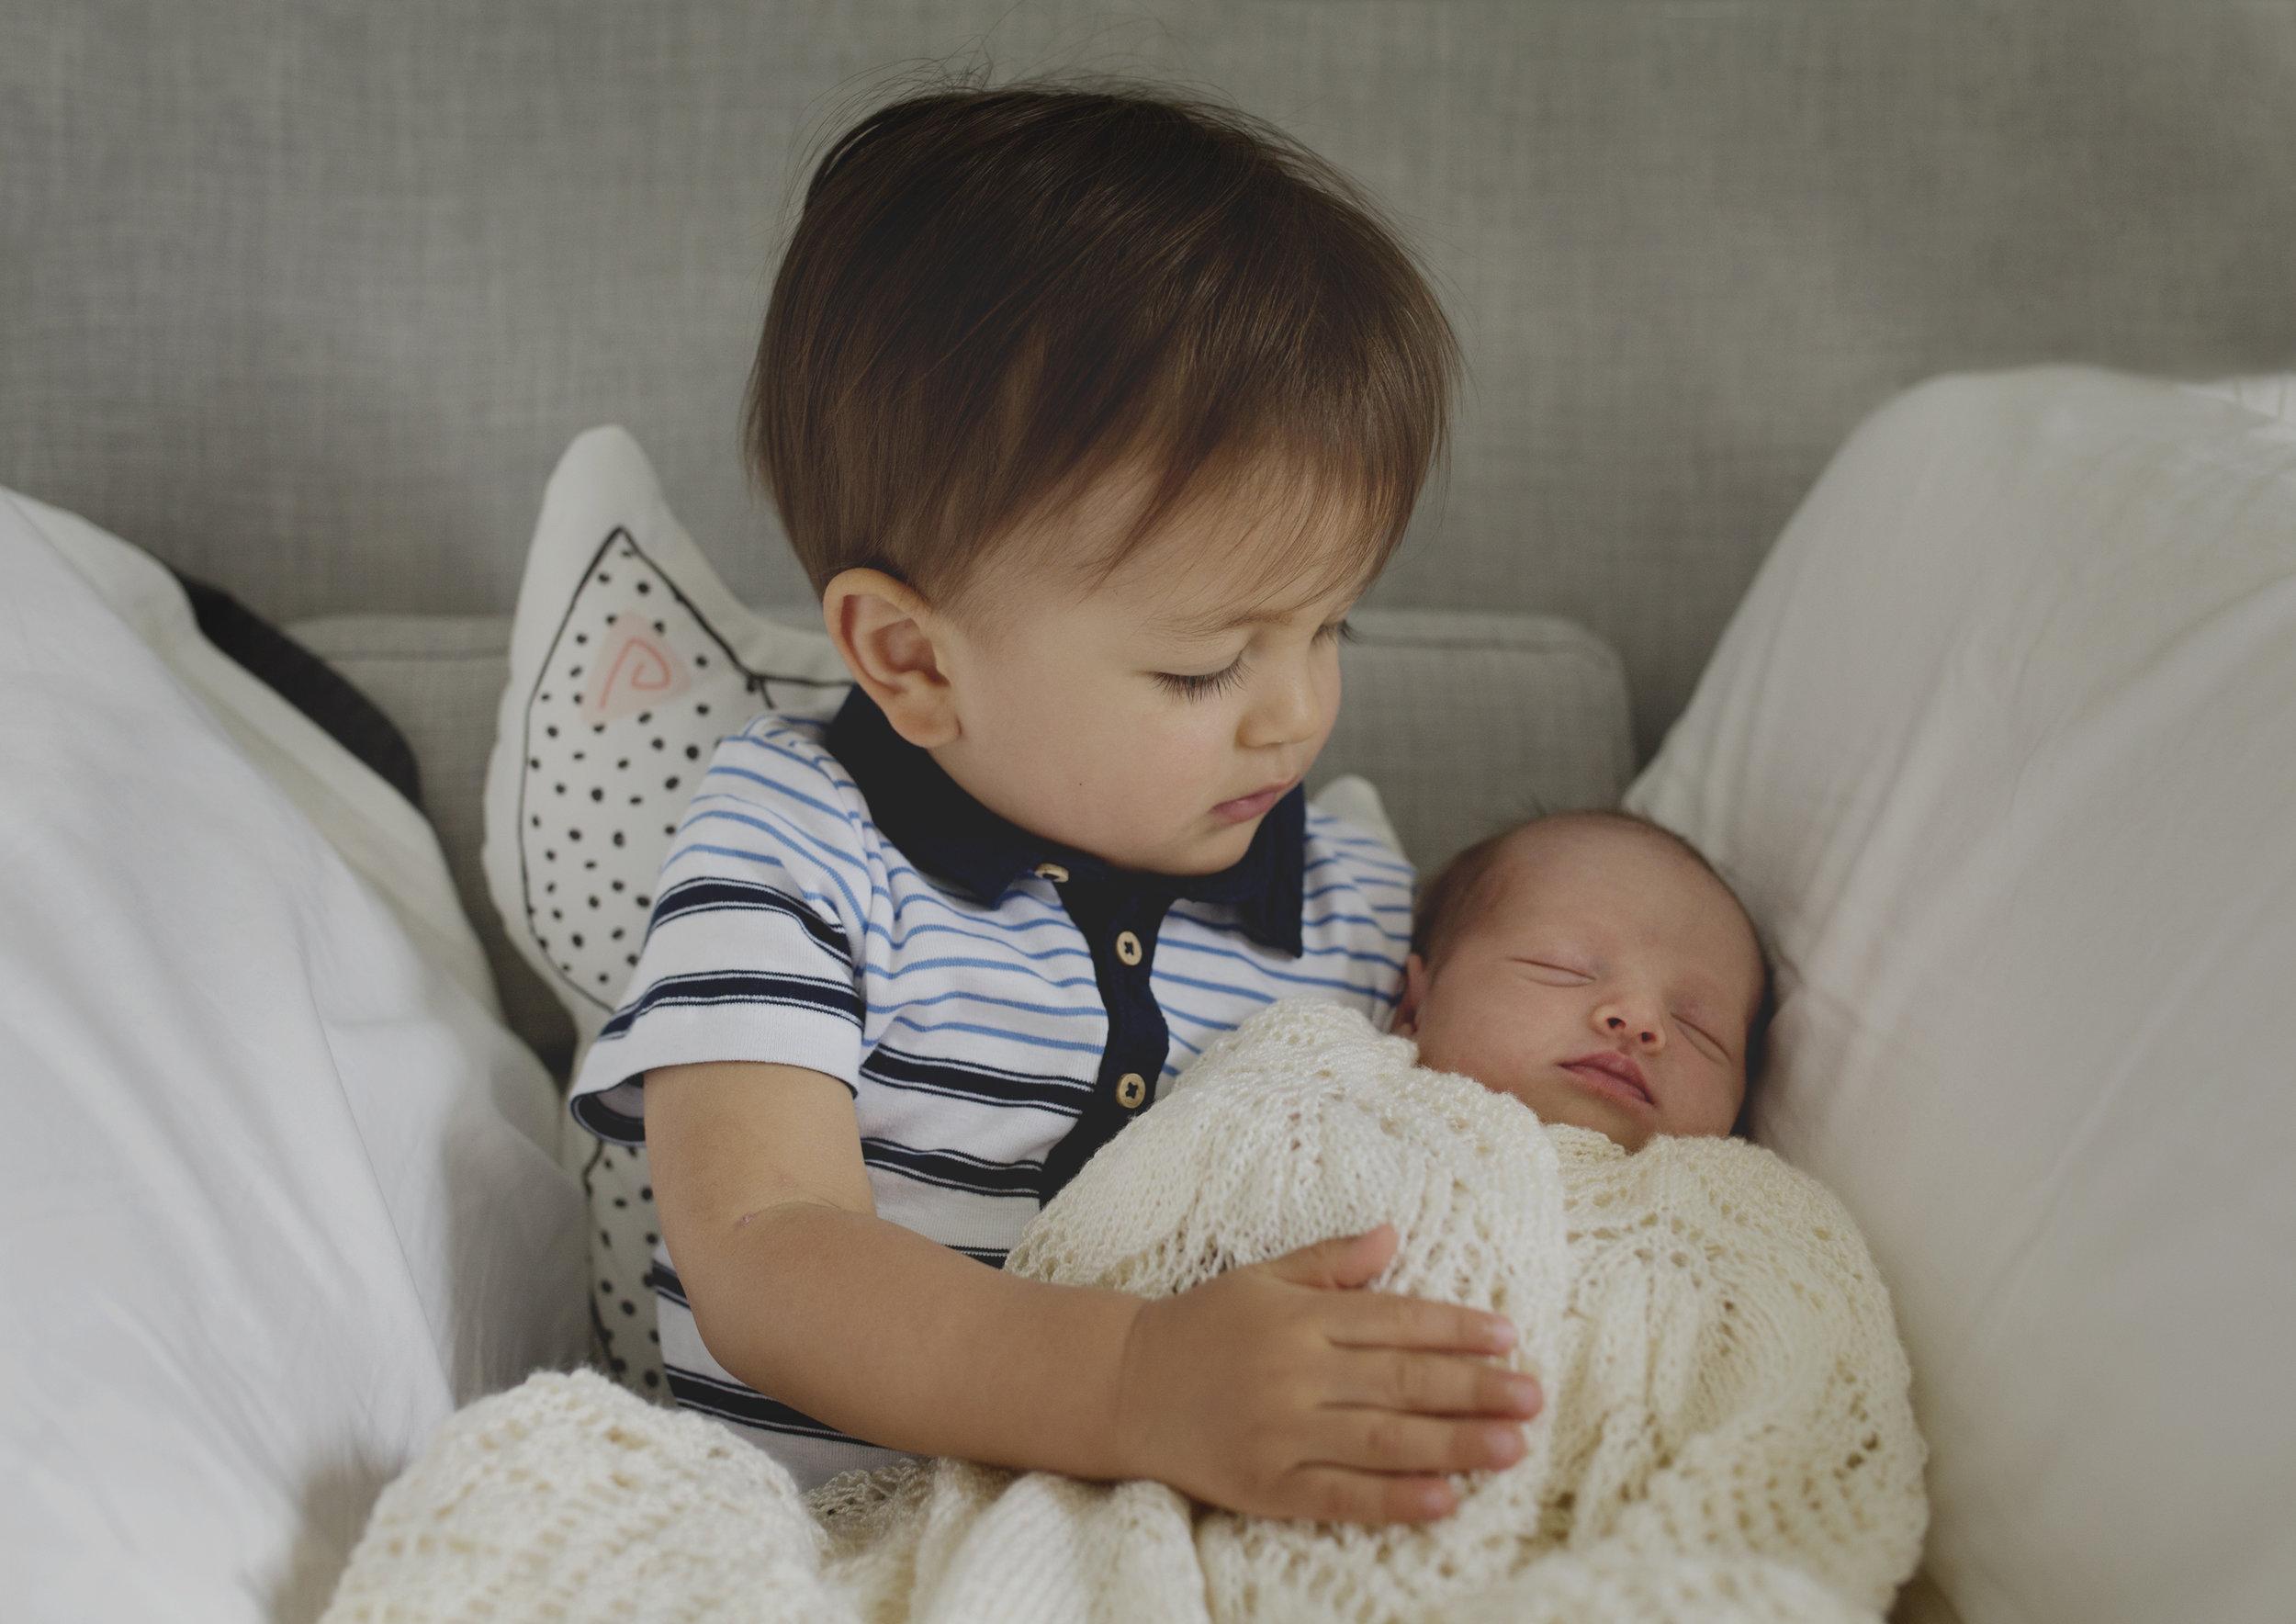 New Big Brother hugging his newborn baby sister